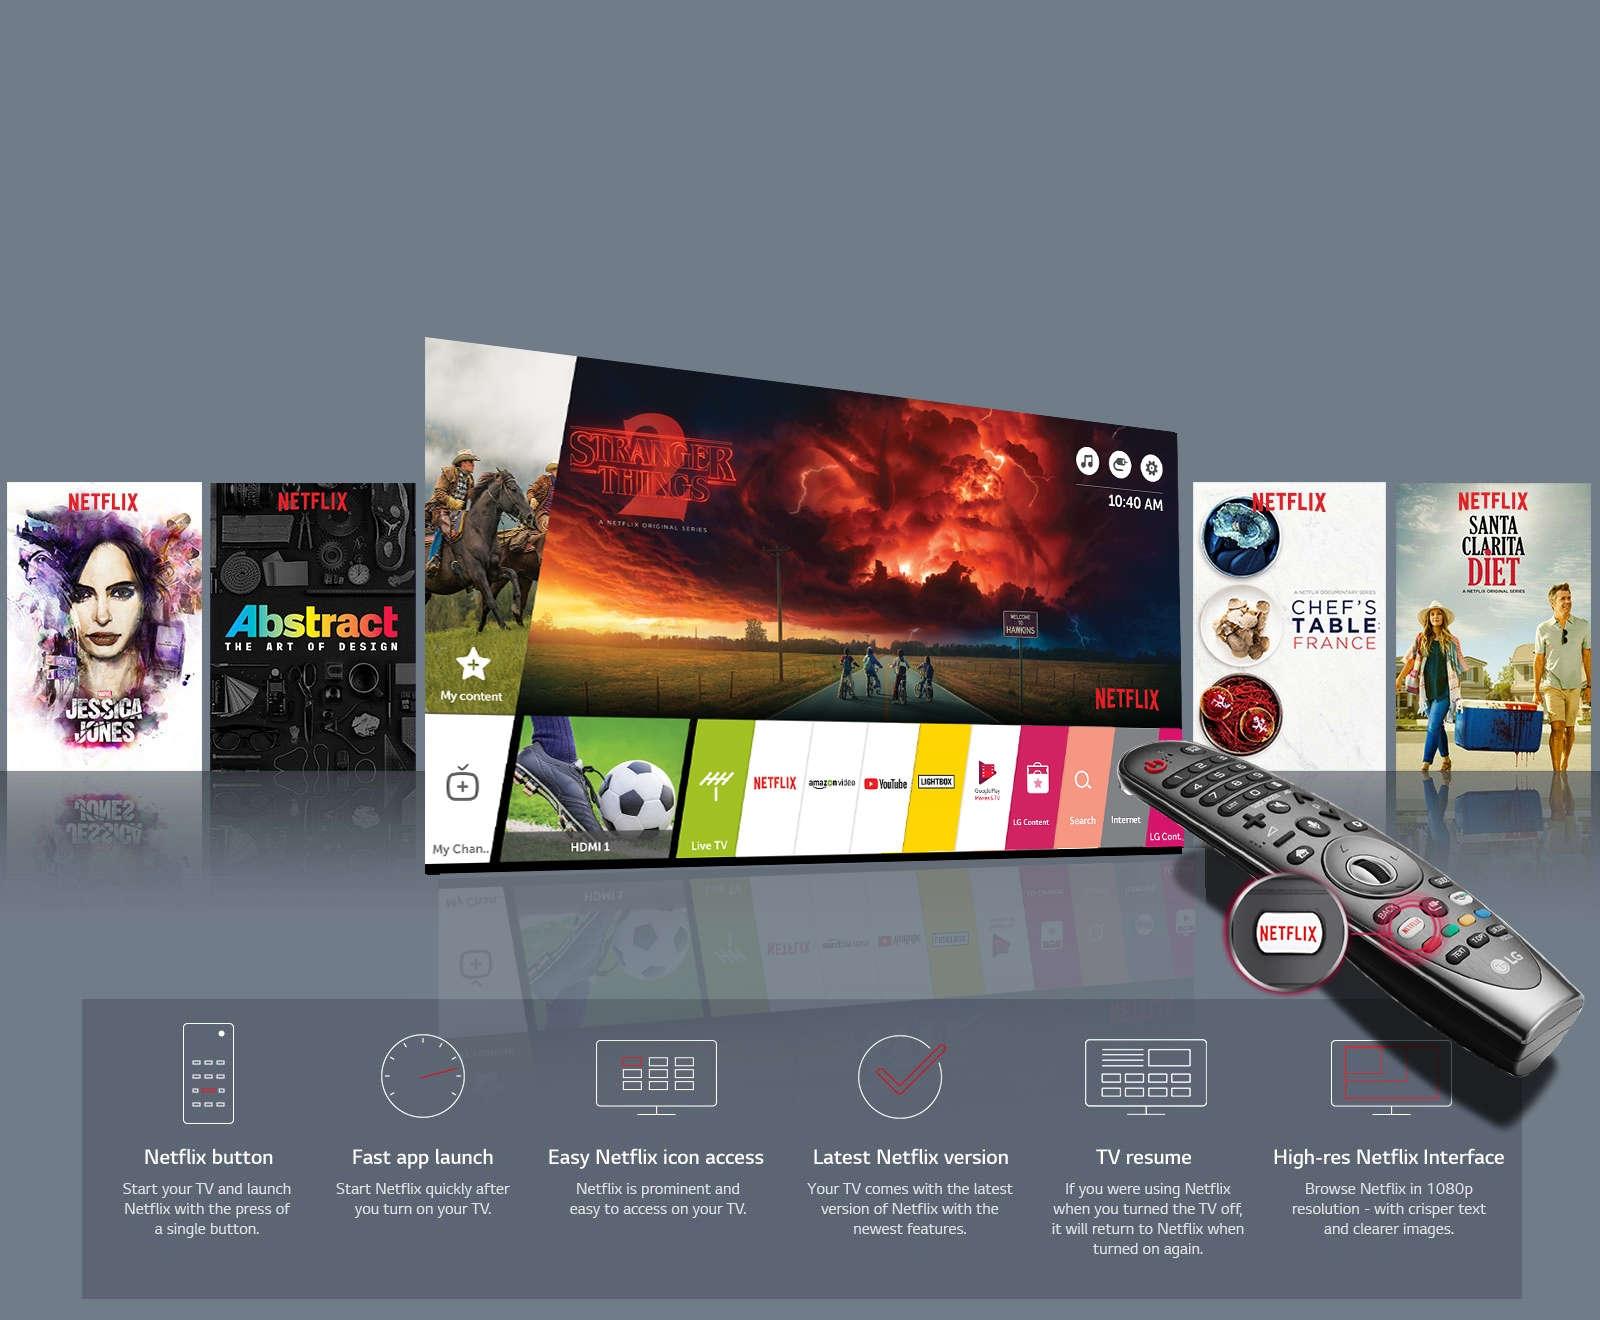 LG 55UK6300 - 55 inch Smart UHD 4K LED TV - New 2018 model